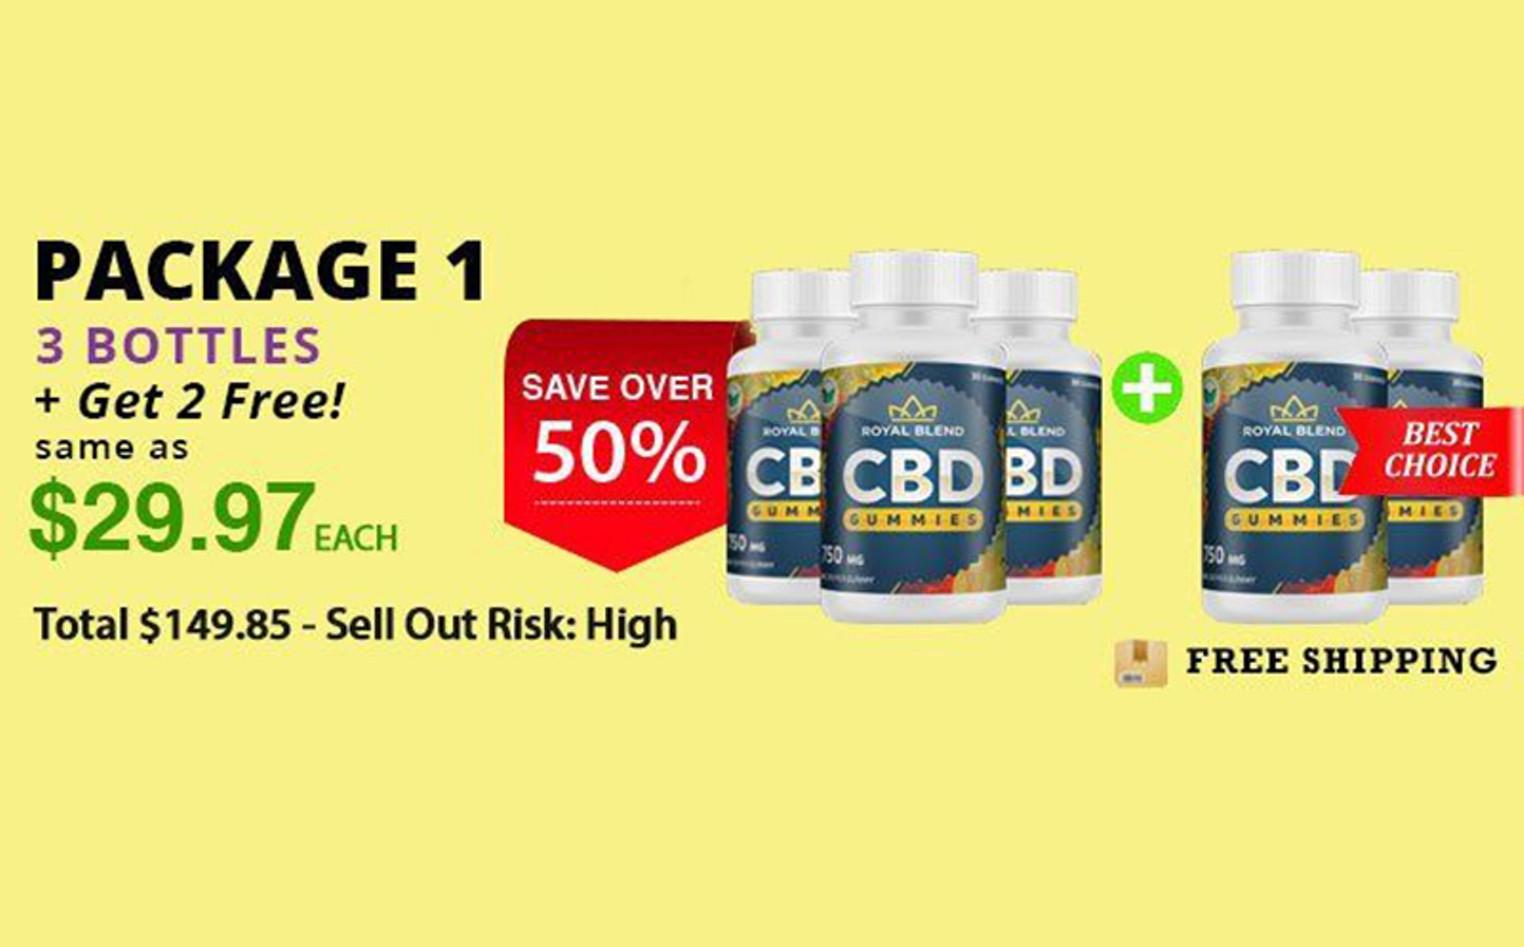 Royal Blend CBD Gummies Legit Buy OR Side Effects - Worth Price Reviews